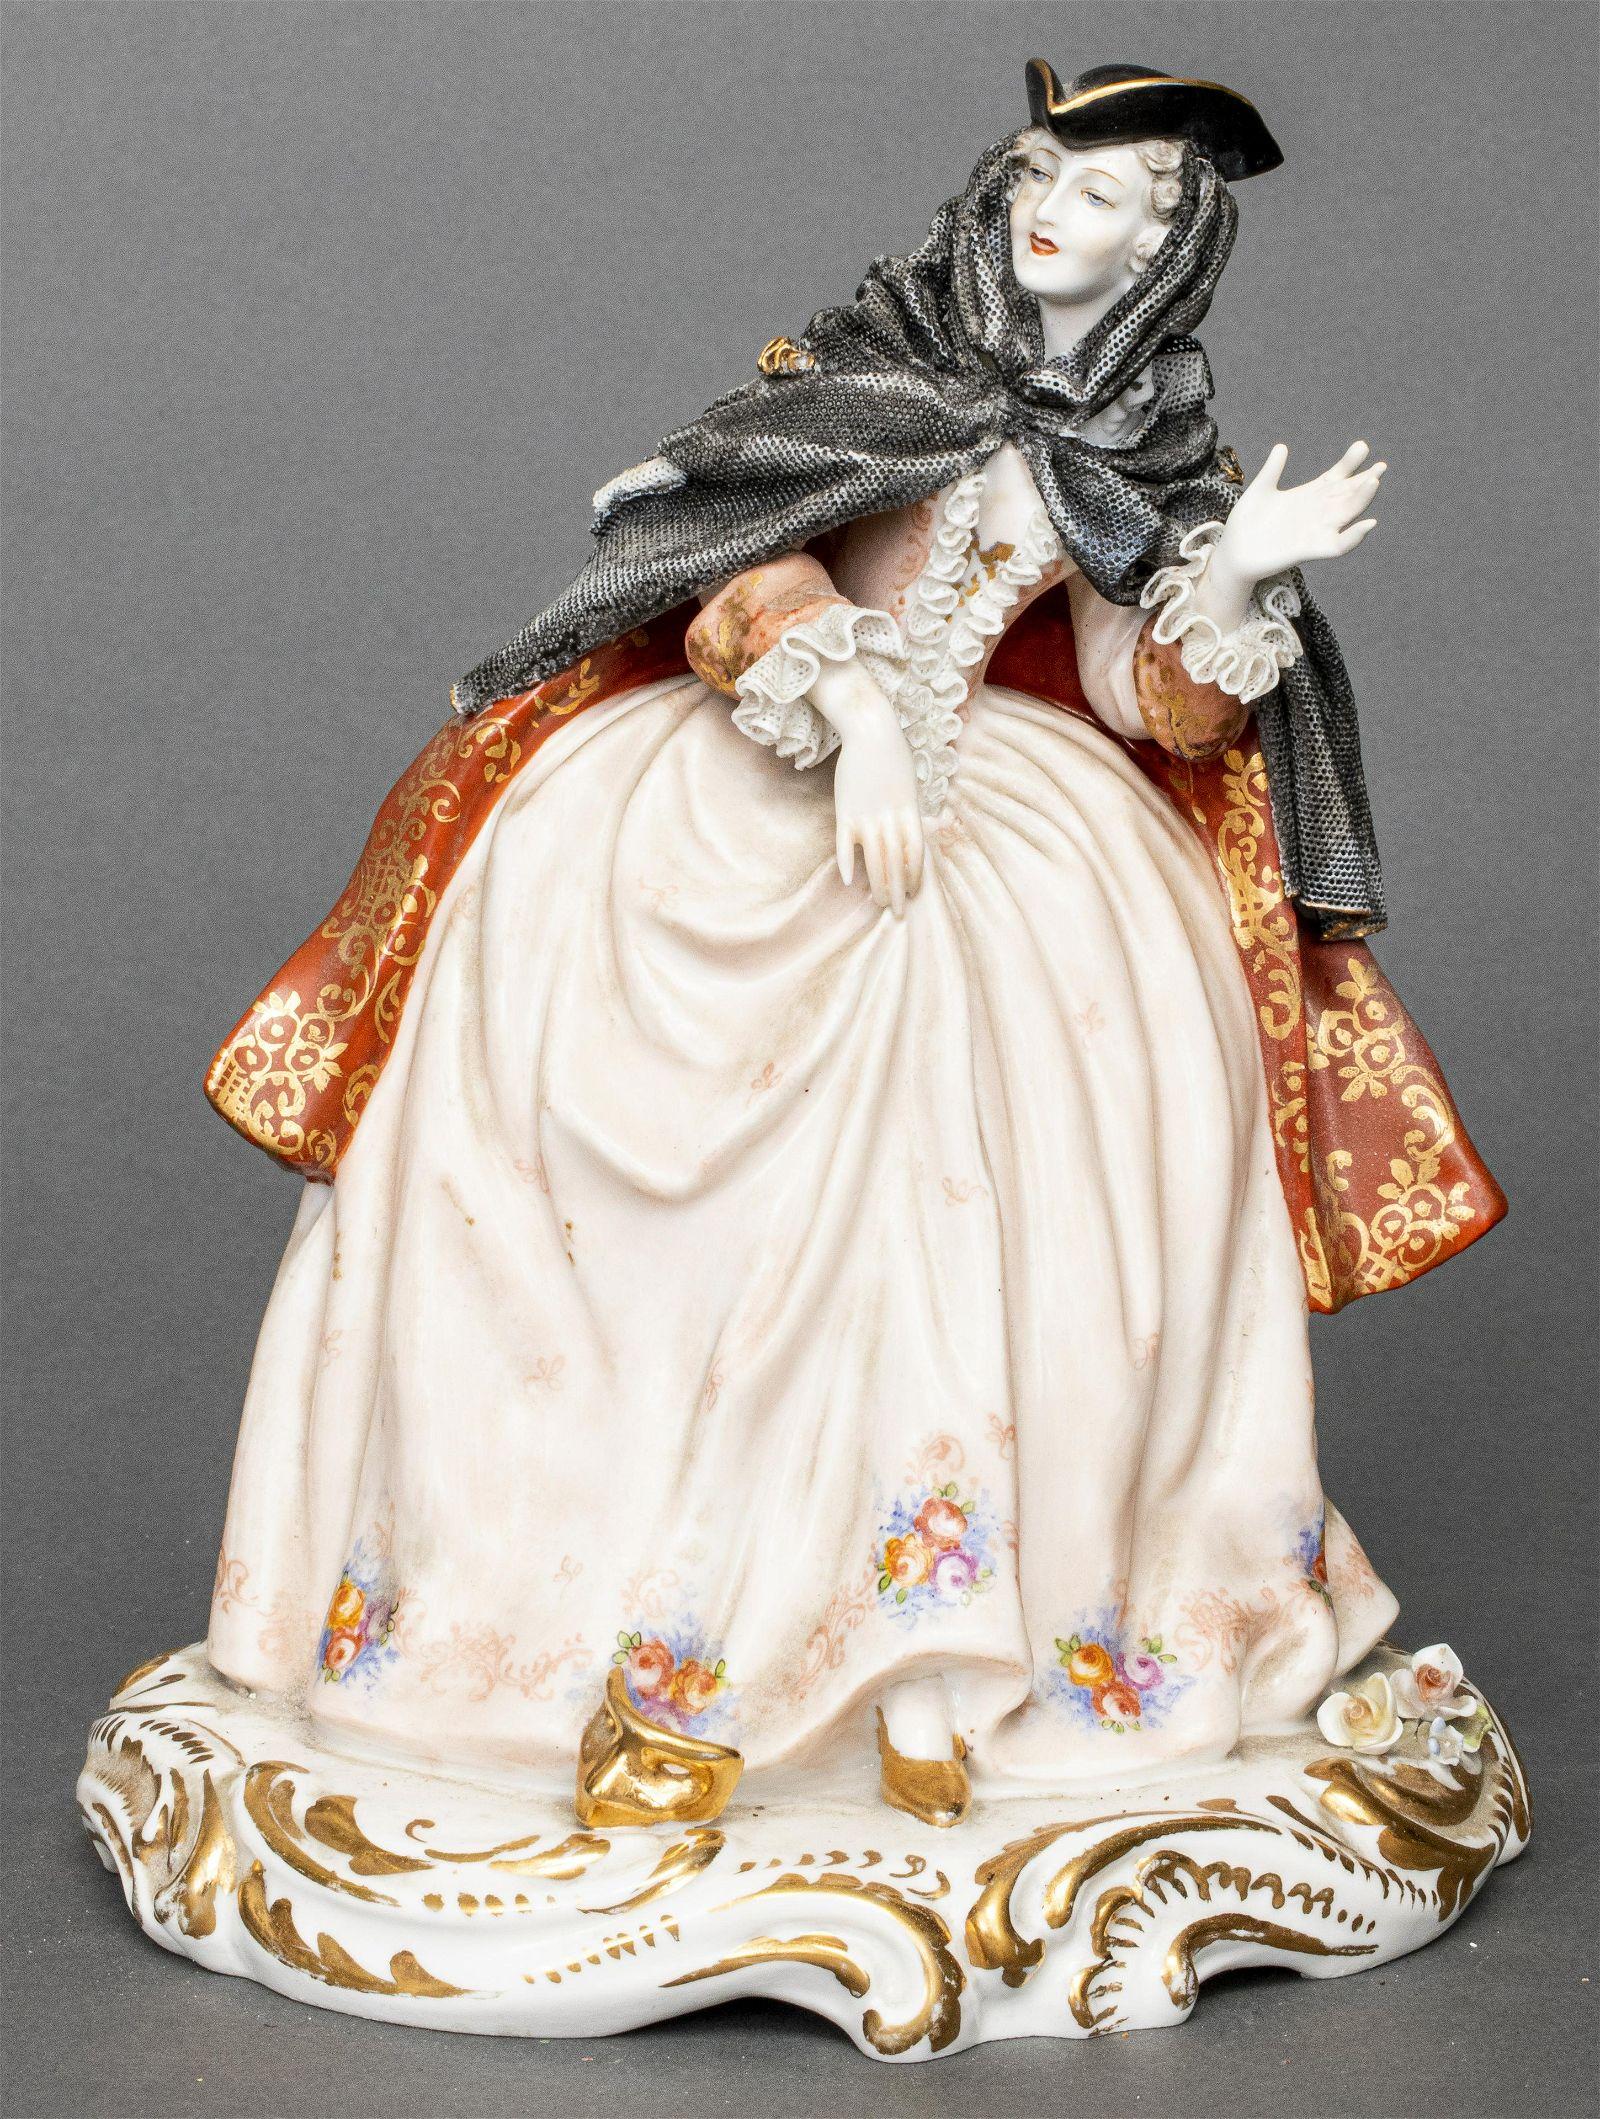 Italian Porcelain Figurine of 18th C. Woman